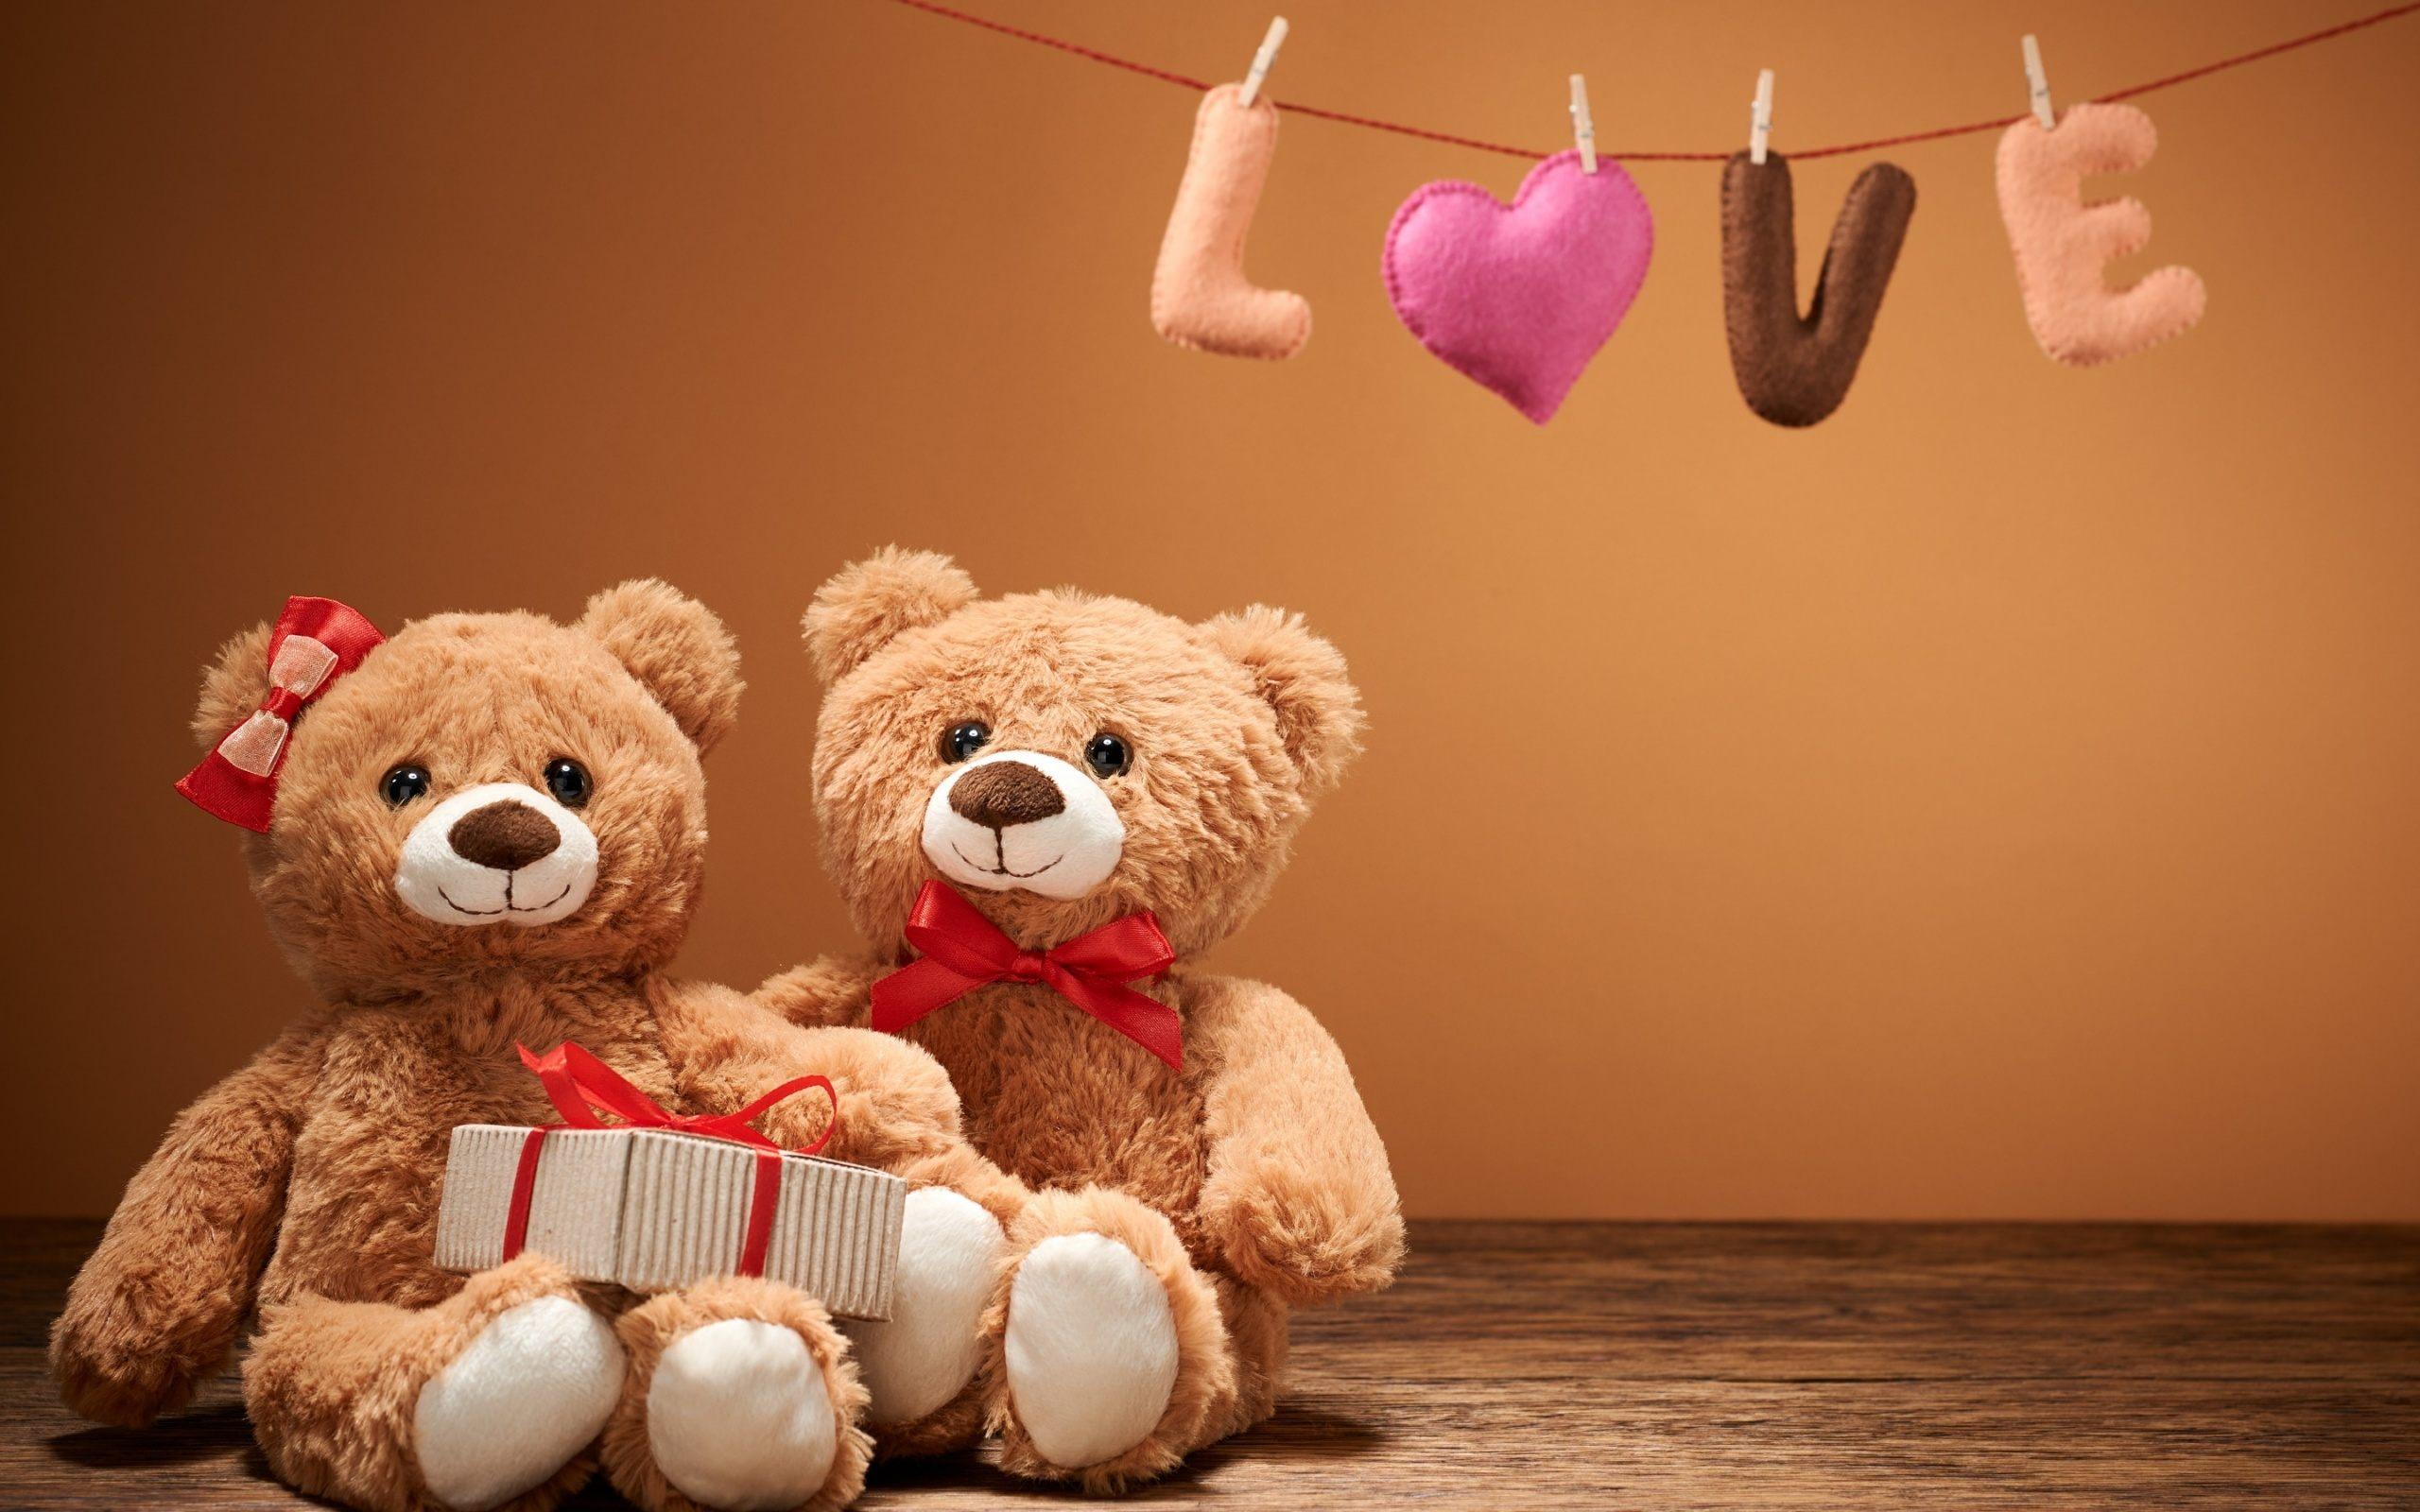 76 Teddy Bear Love Wallpaper On Wallpapersafari